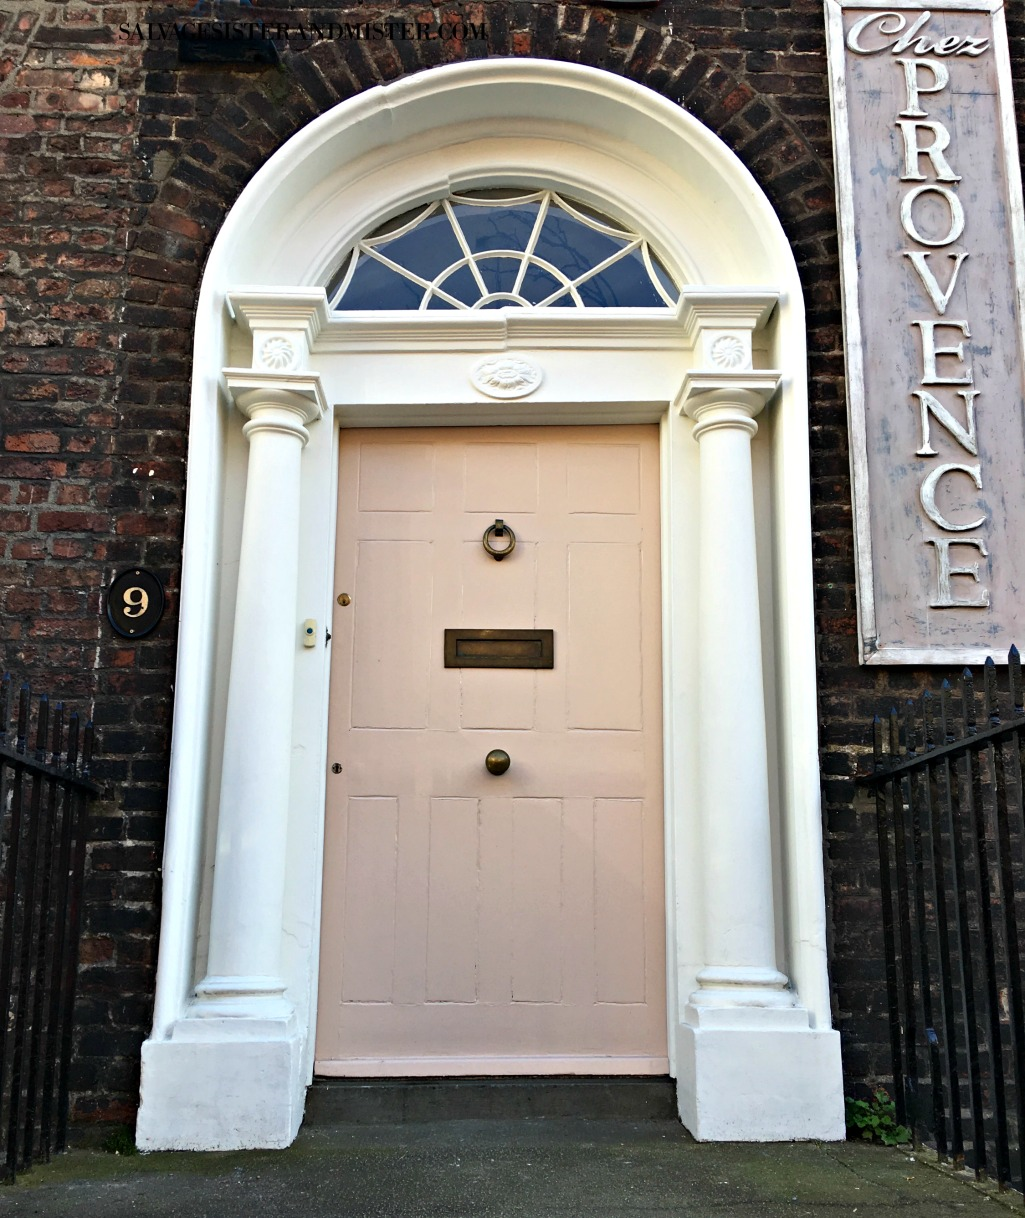 exploring ireland - doors of Ireland on salvagesisterandmister.com